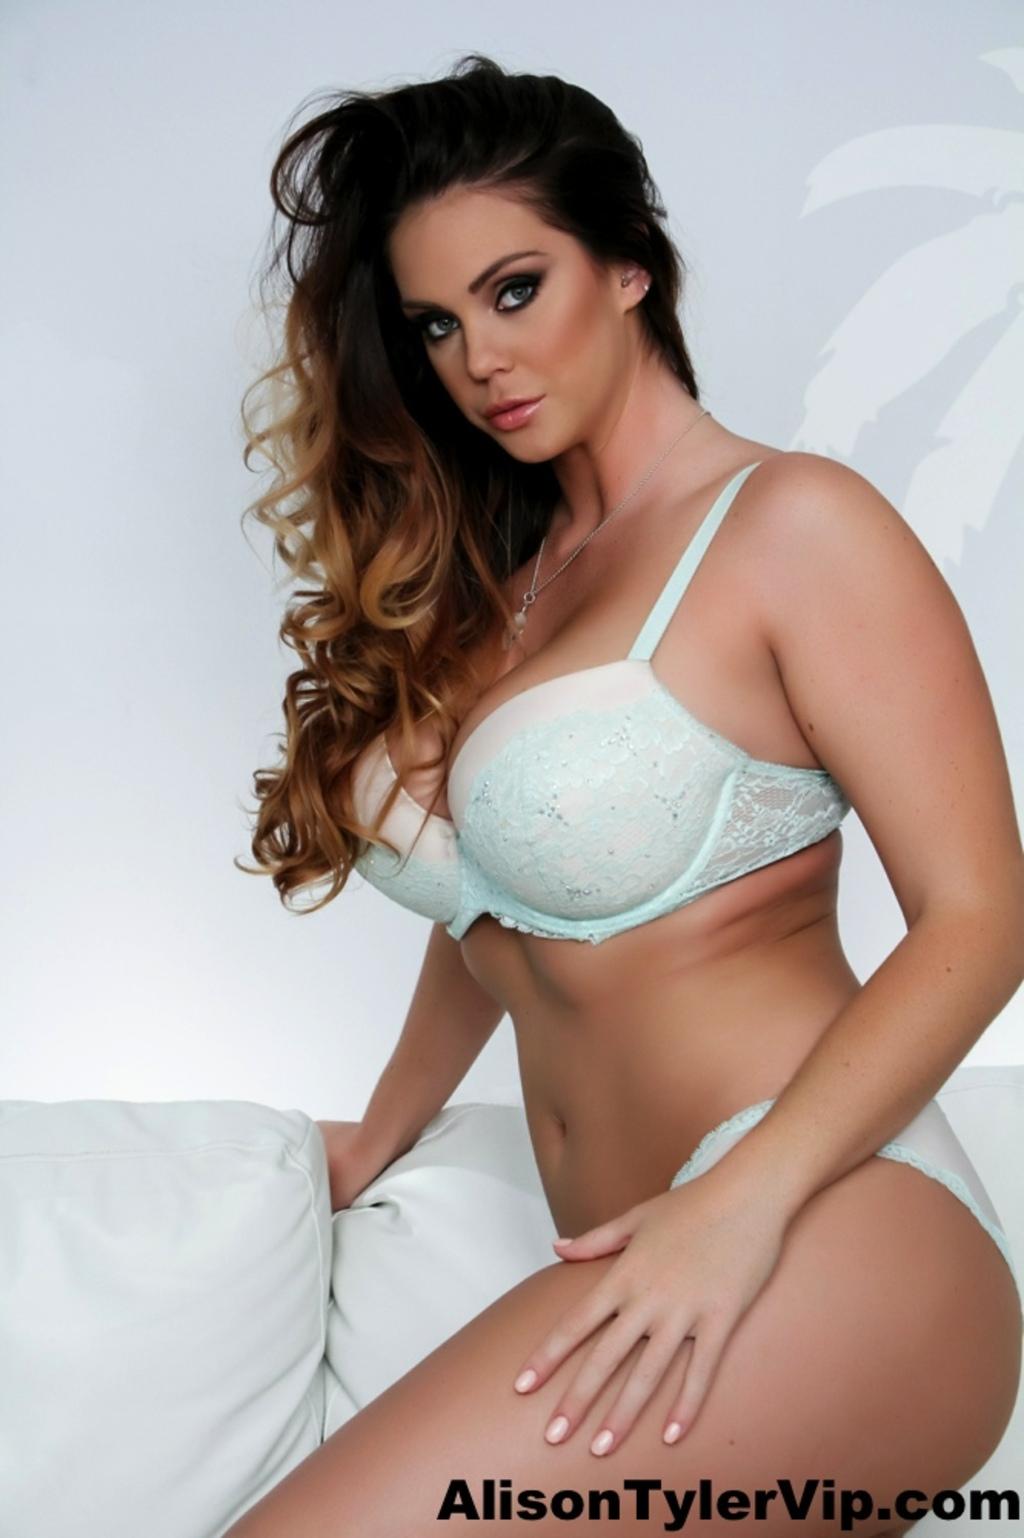 Alison Tyler Nude Pics busty alison tyler posing in lingerie - alison tyler sexy